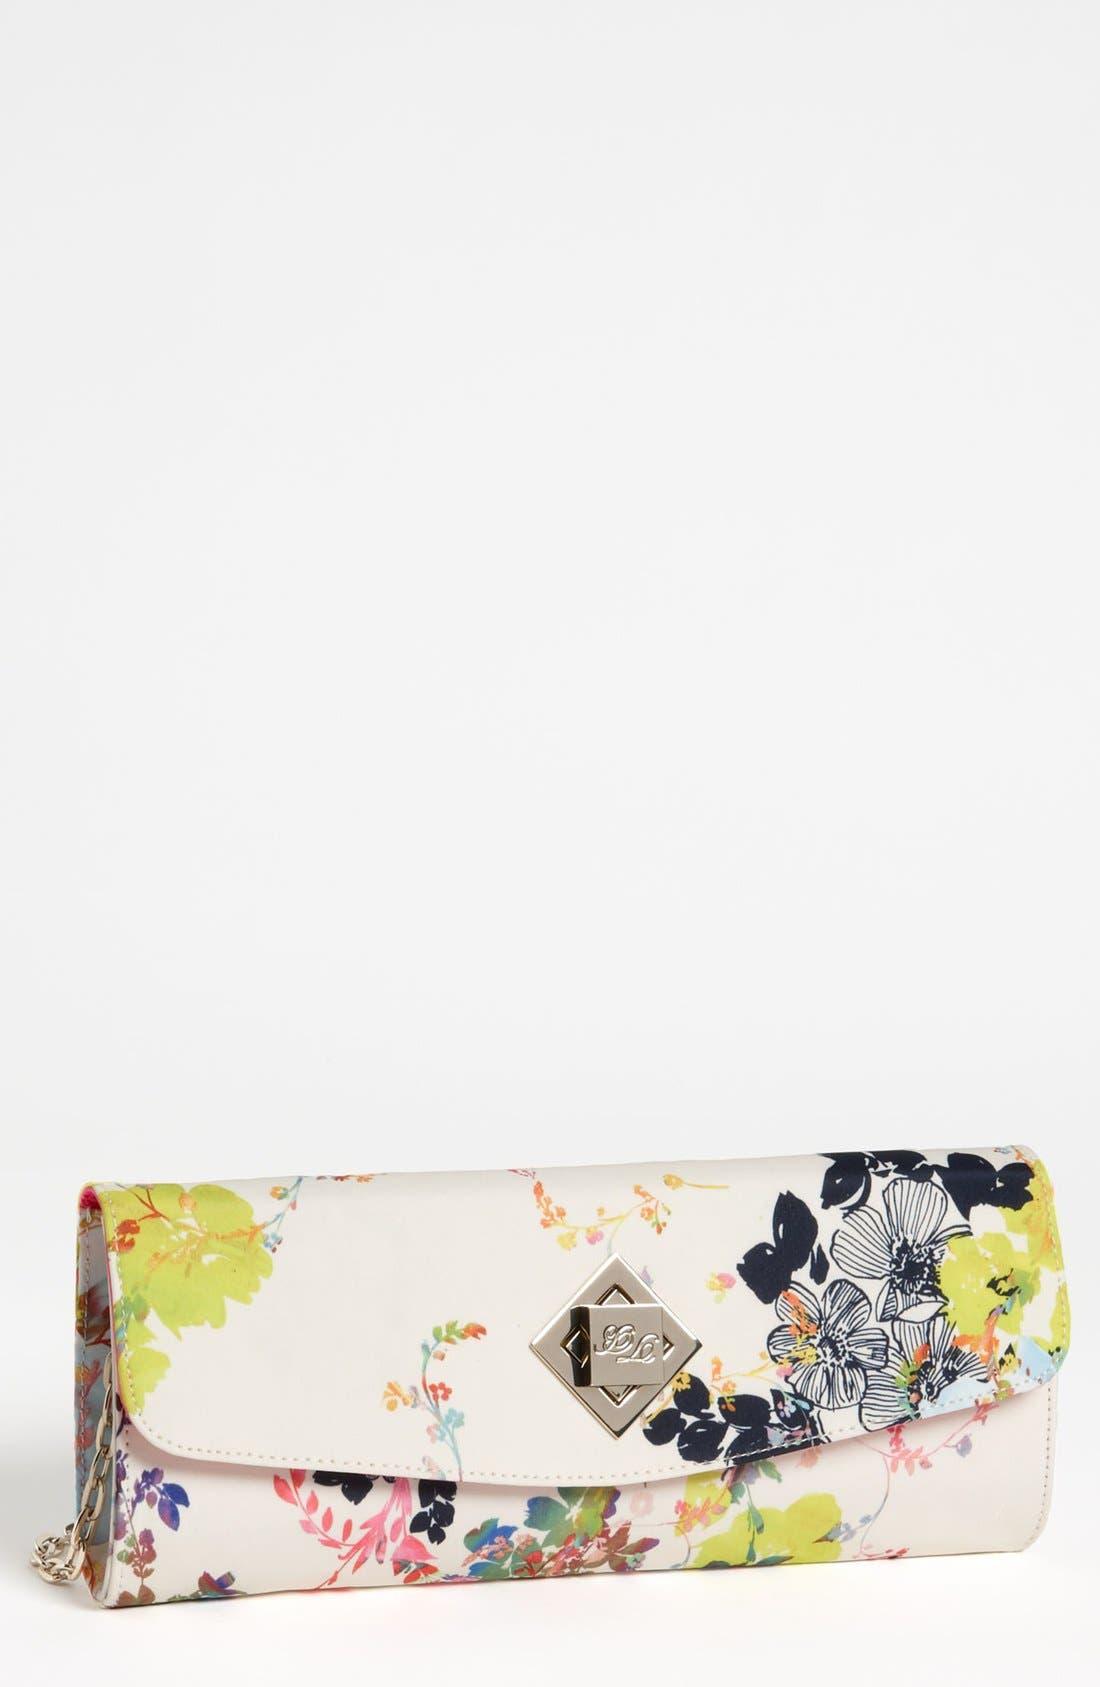 Main Image - Ted Baker London 'Summer Bloom' Twist Lock Envelope Clutch